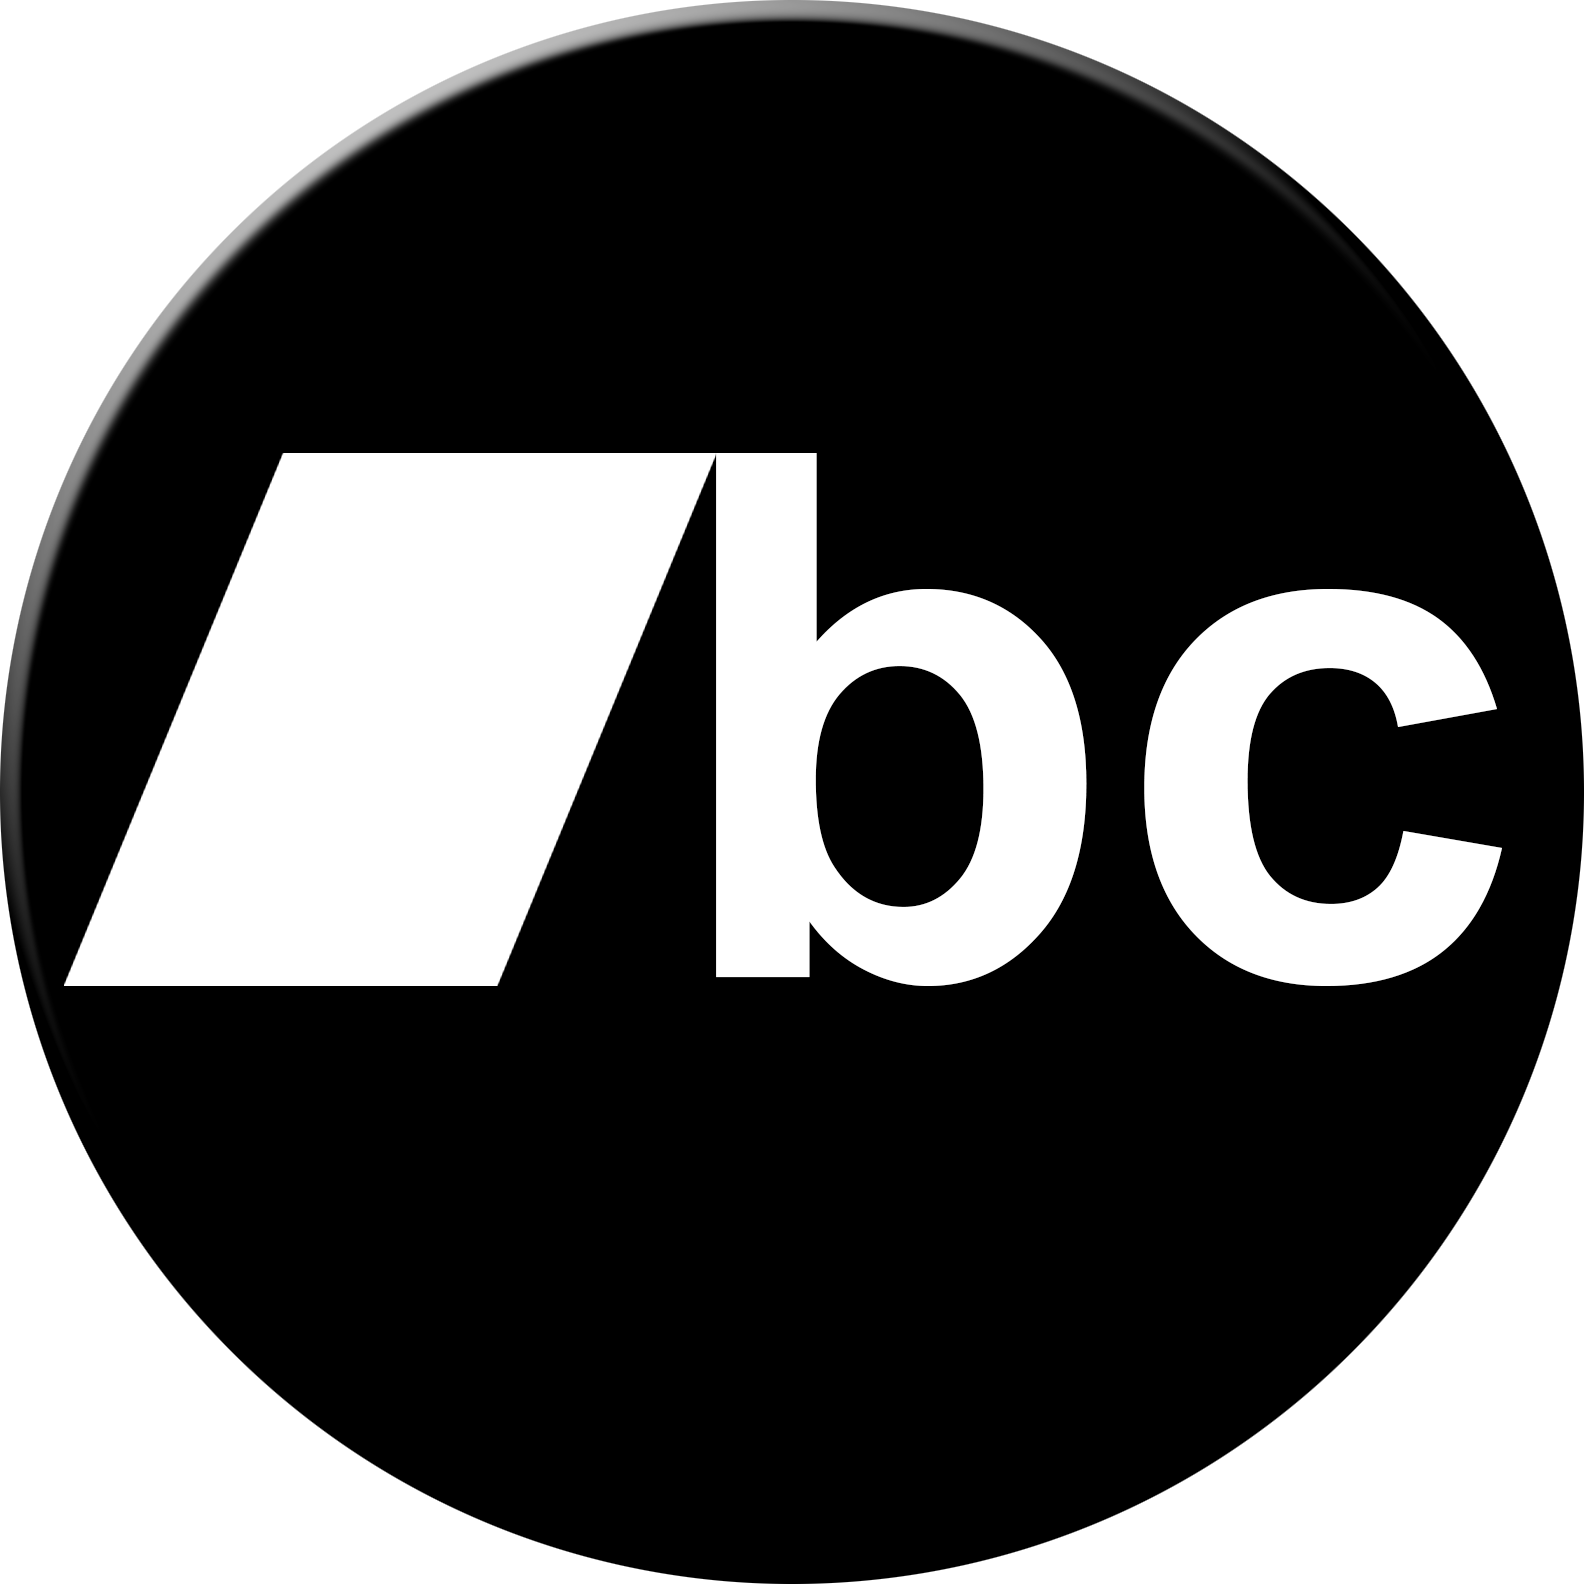 bandcamp logo images - HD1584×1584